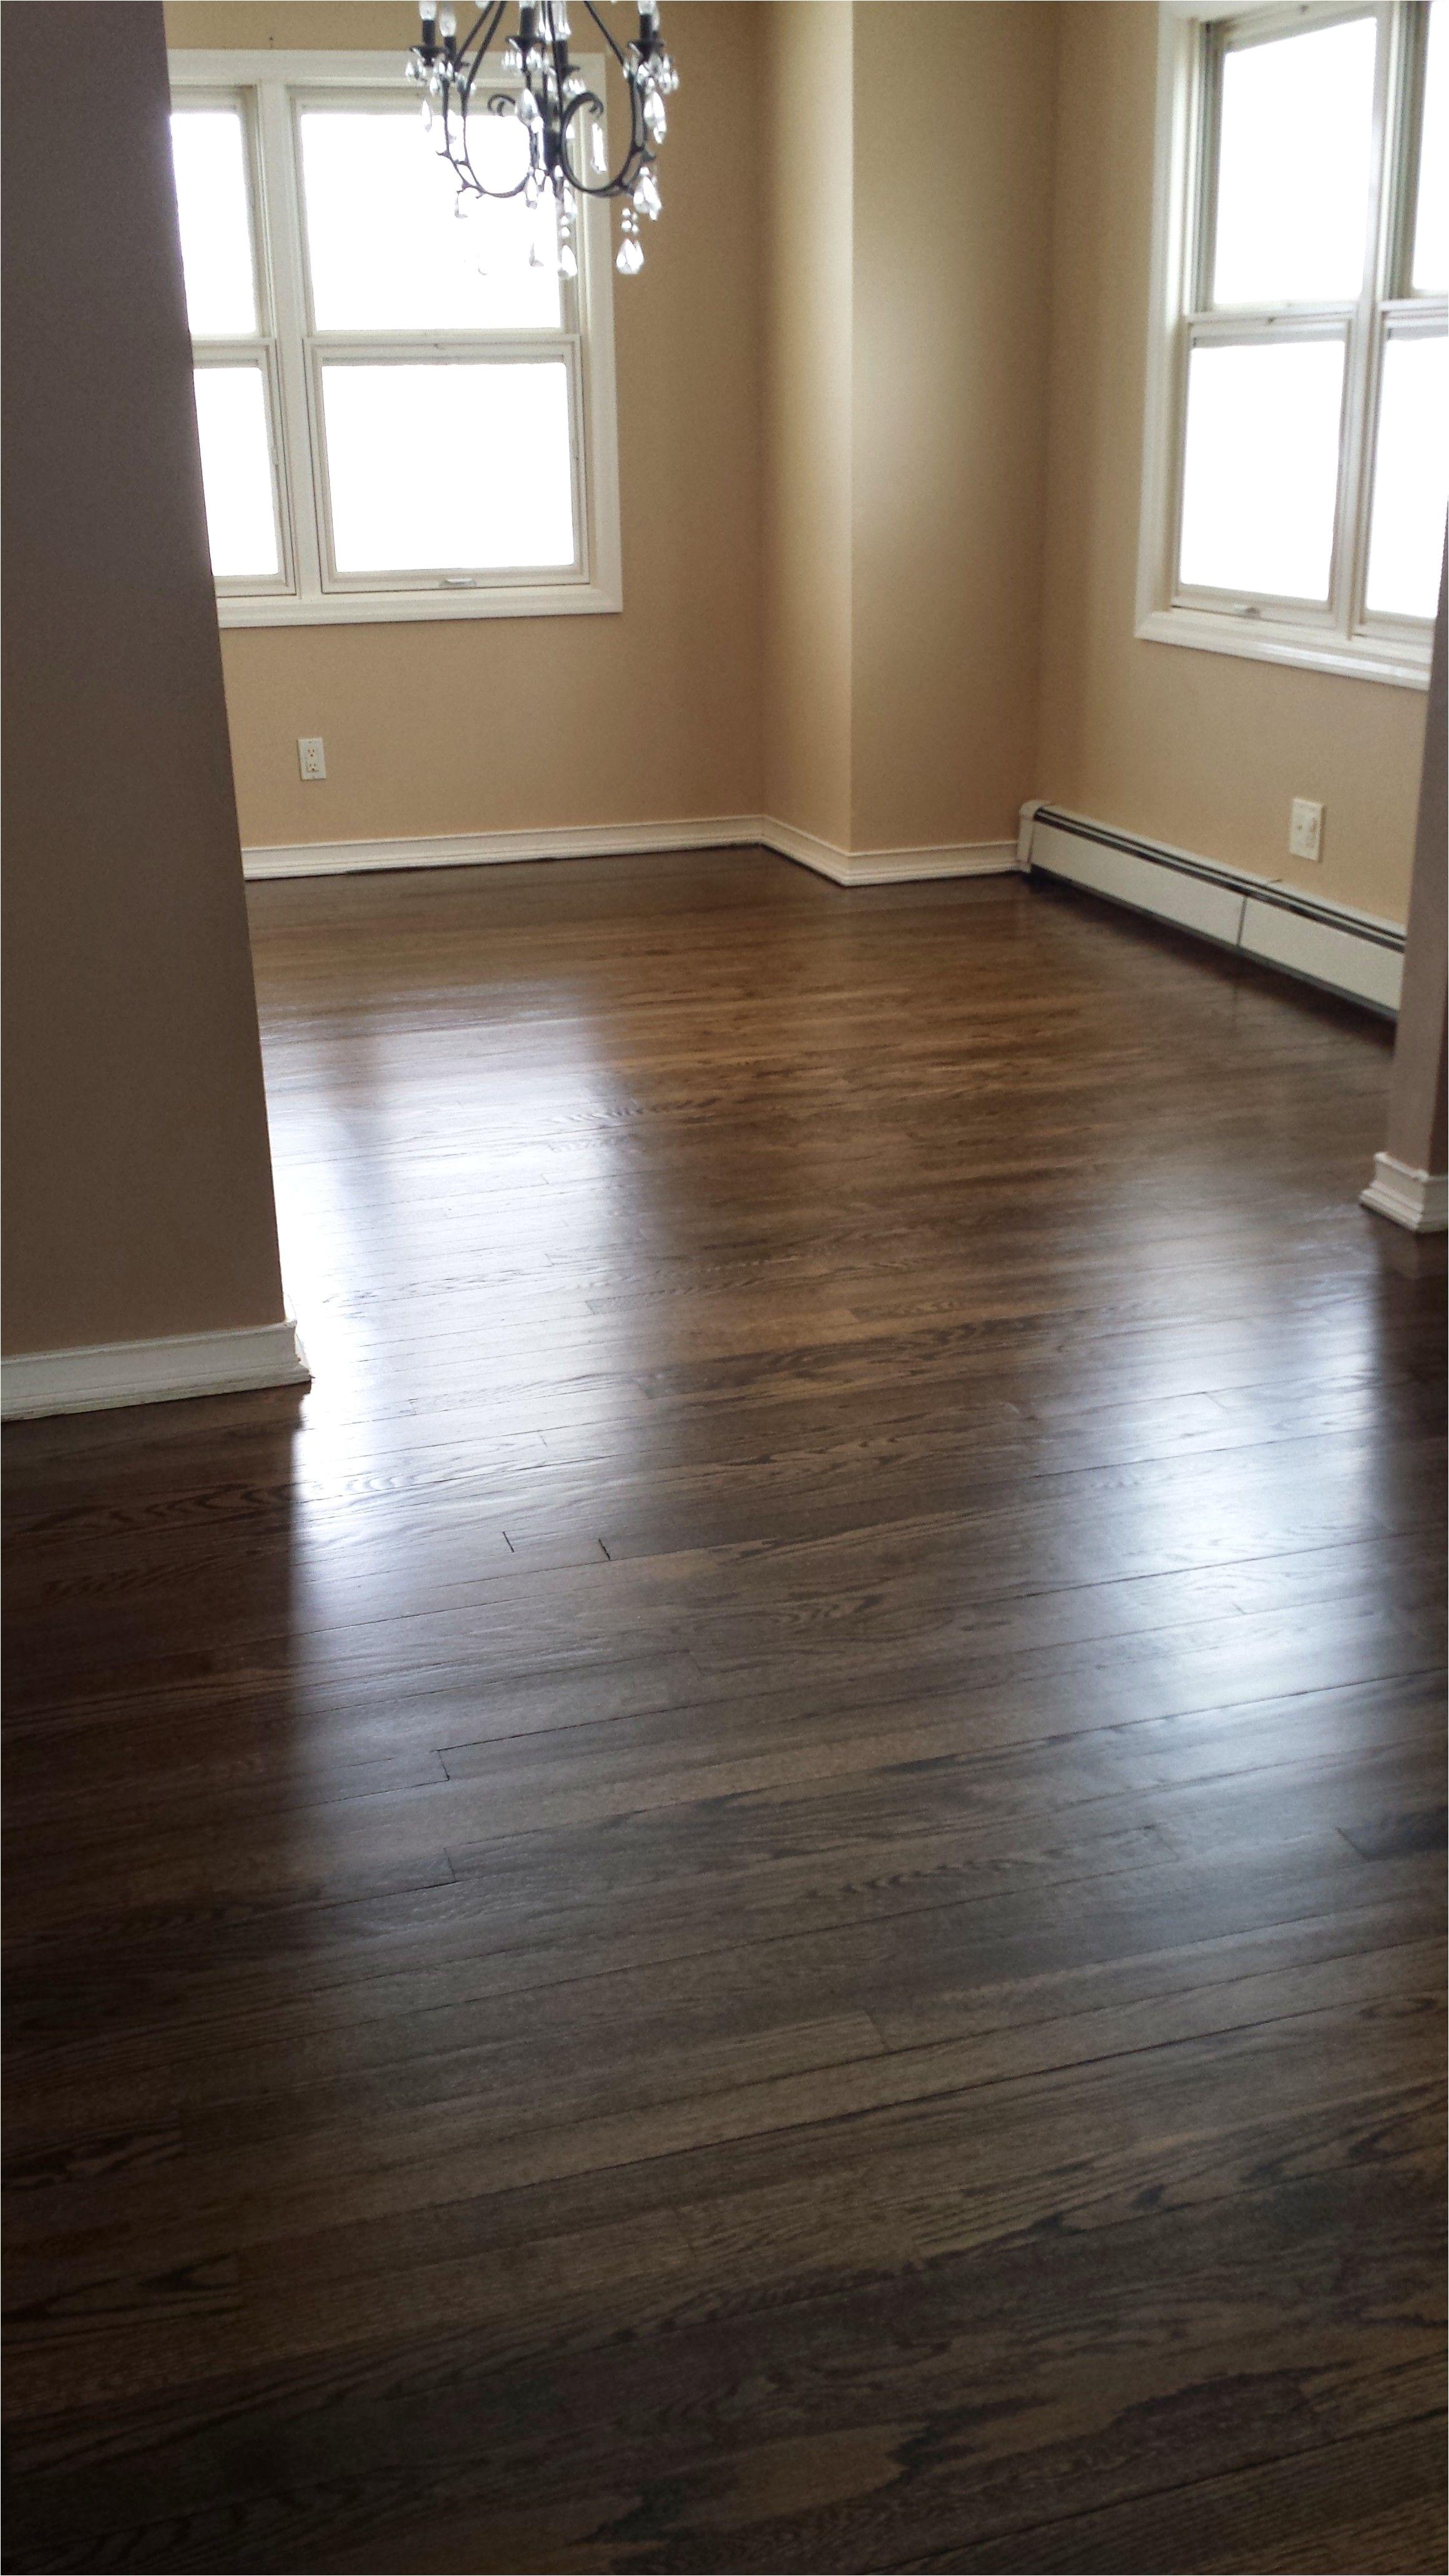 how to refurbish hardwood floors yourself of refinish hardwood floors diy dahuacctvth com with regard to refinish hardwood floors diy